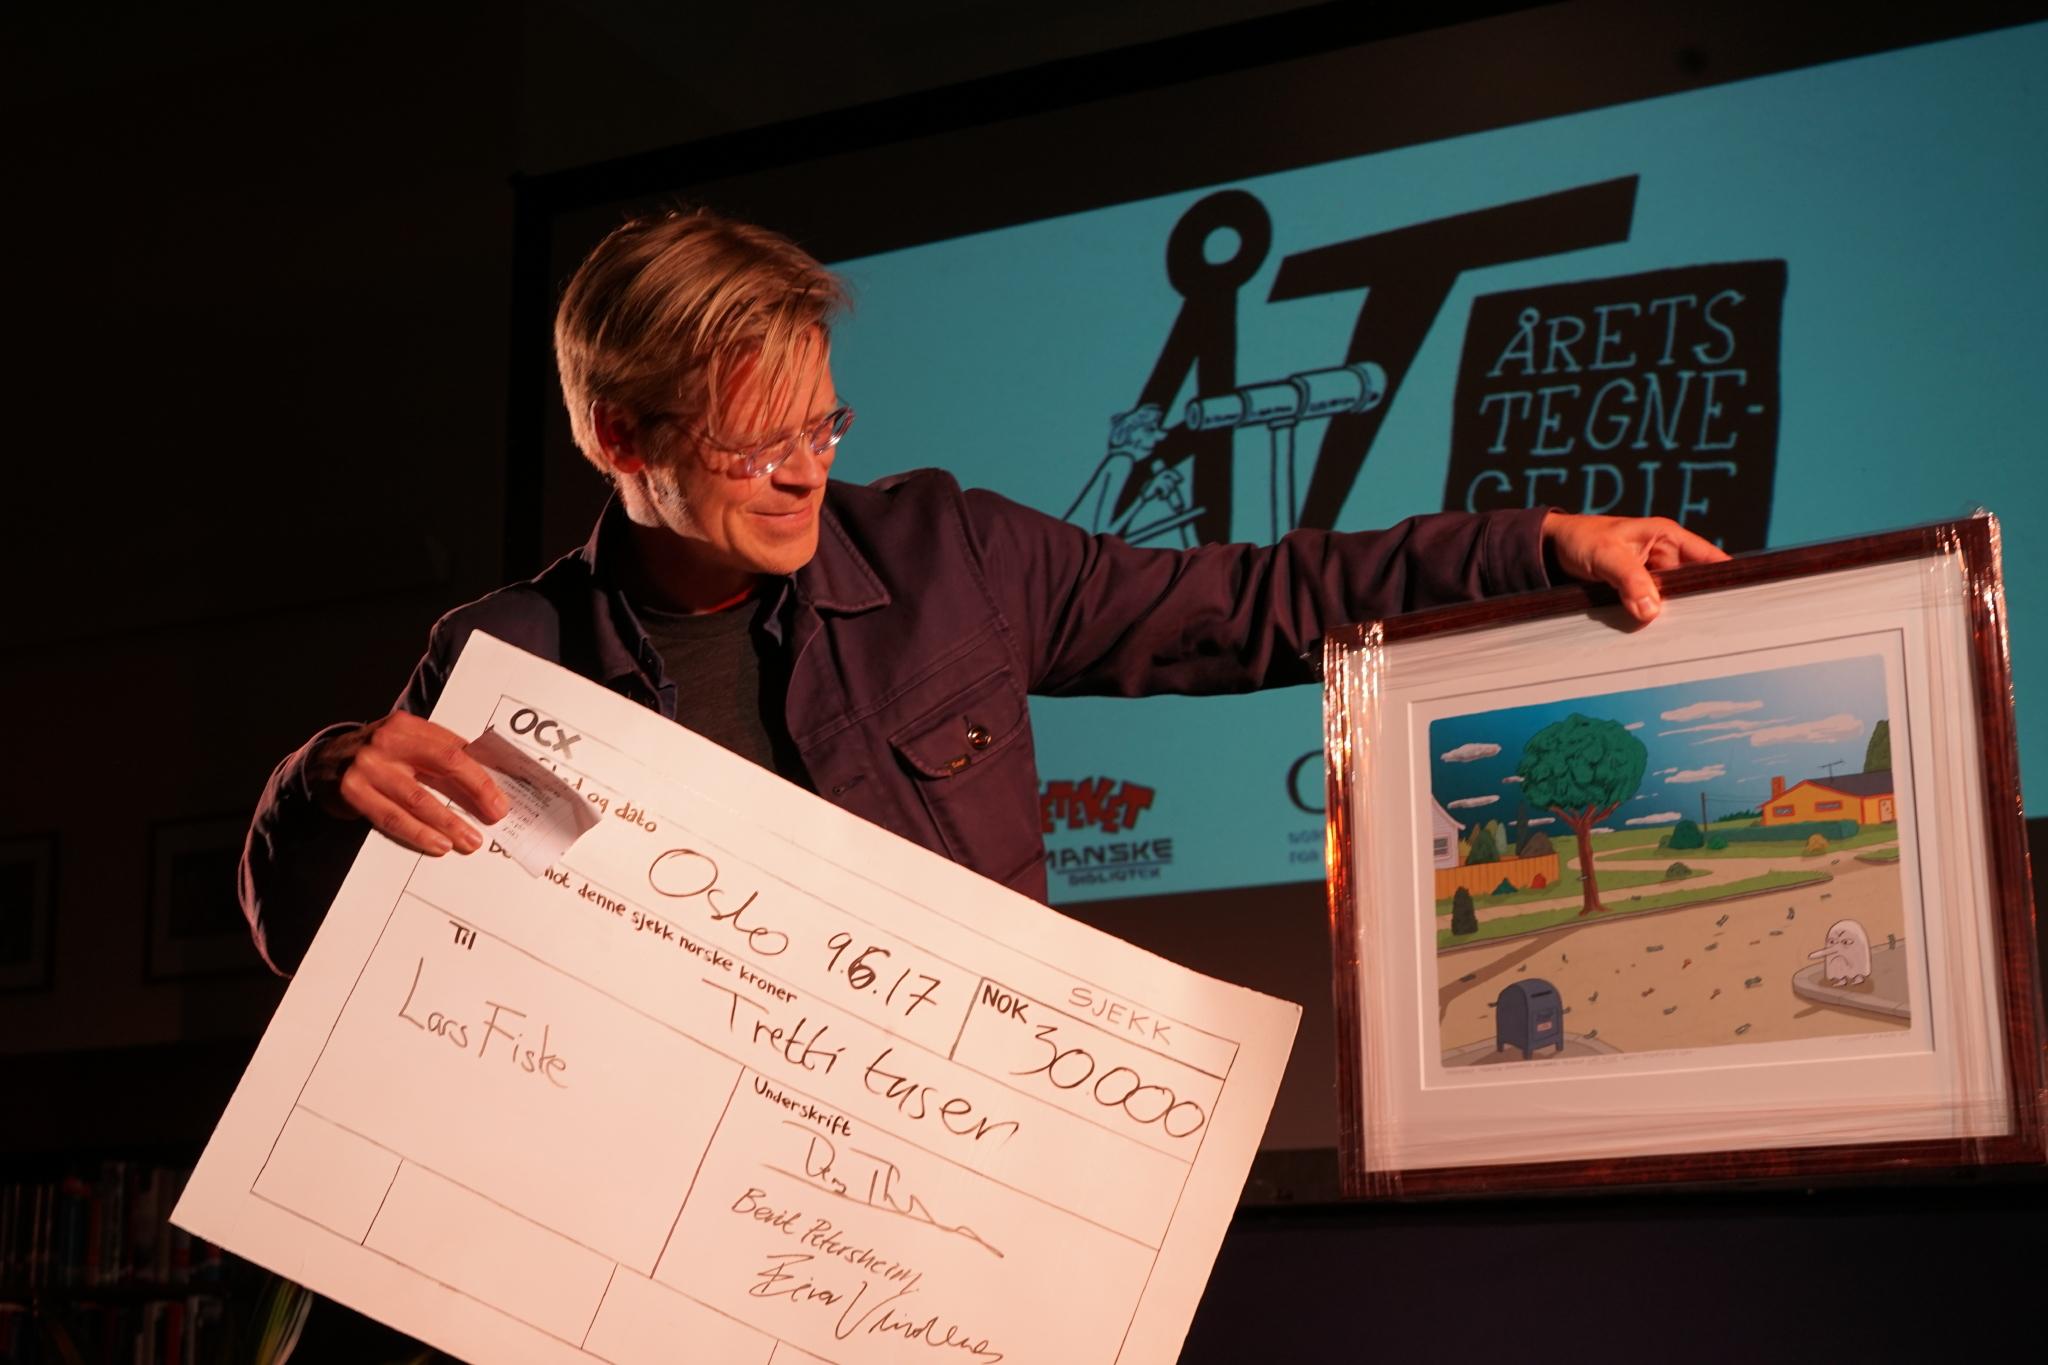 Lars Fiske med Årets tegneserie (foto: Kenneth Korstad/Deichmanske bibliotek)